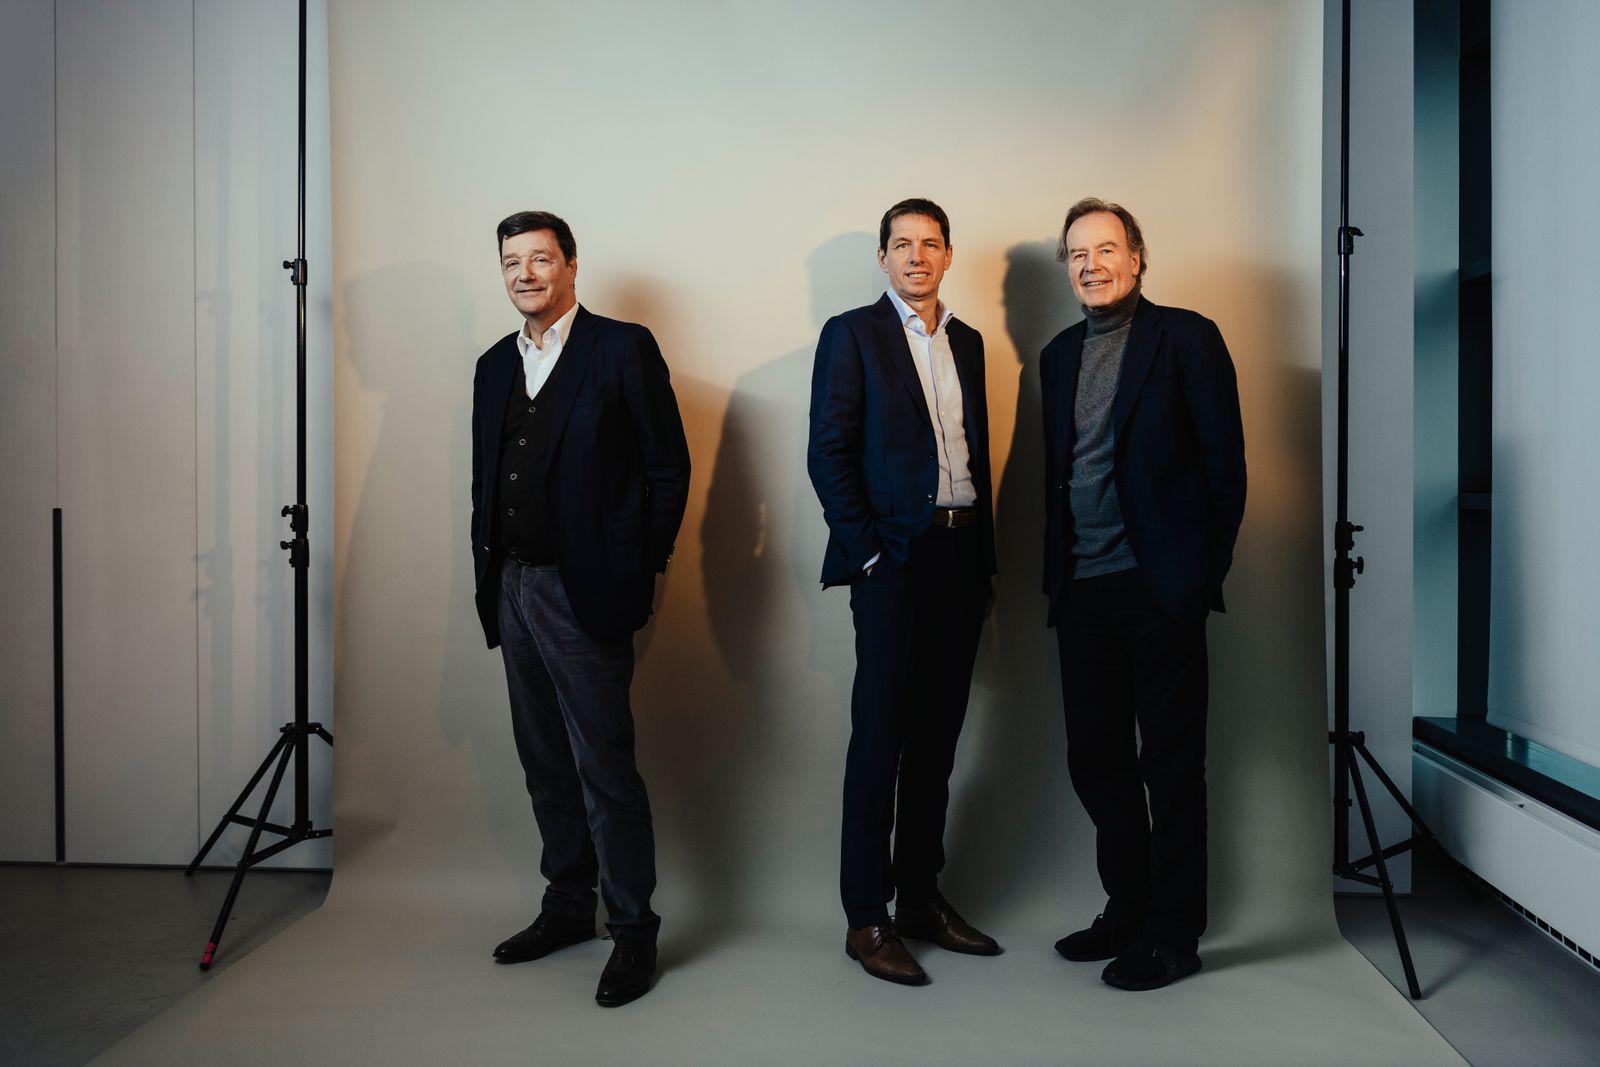 Thomas Strüngmann, Helmut Jeggle und Michael Motschmann